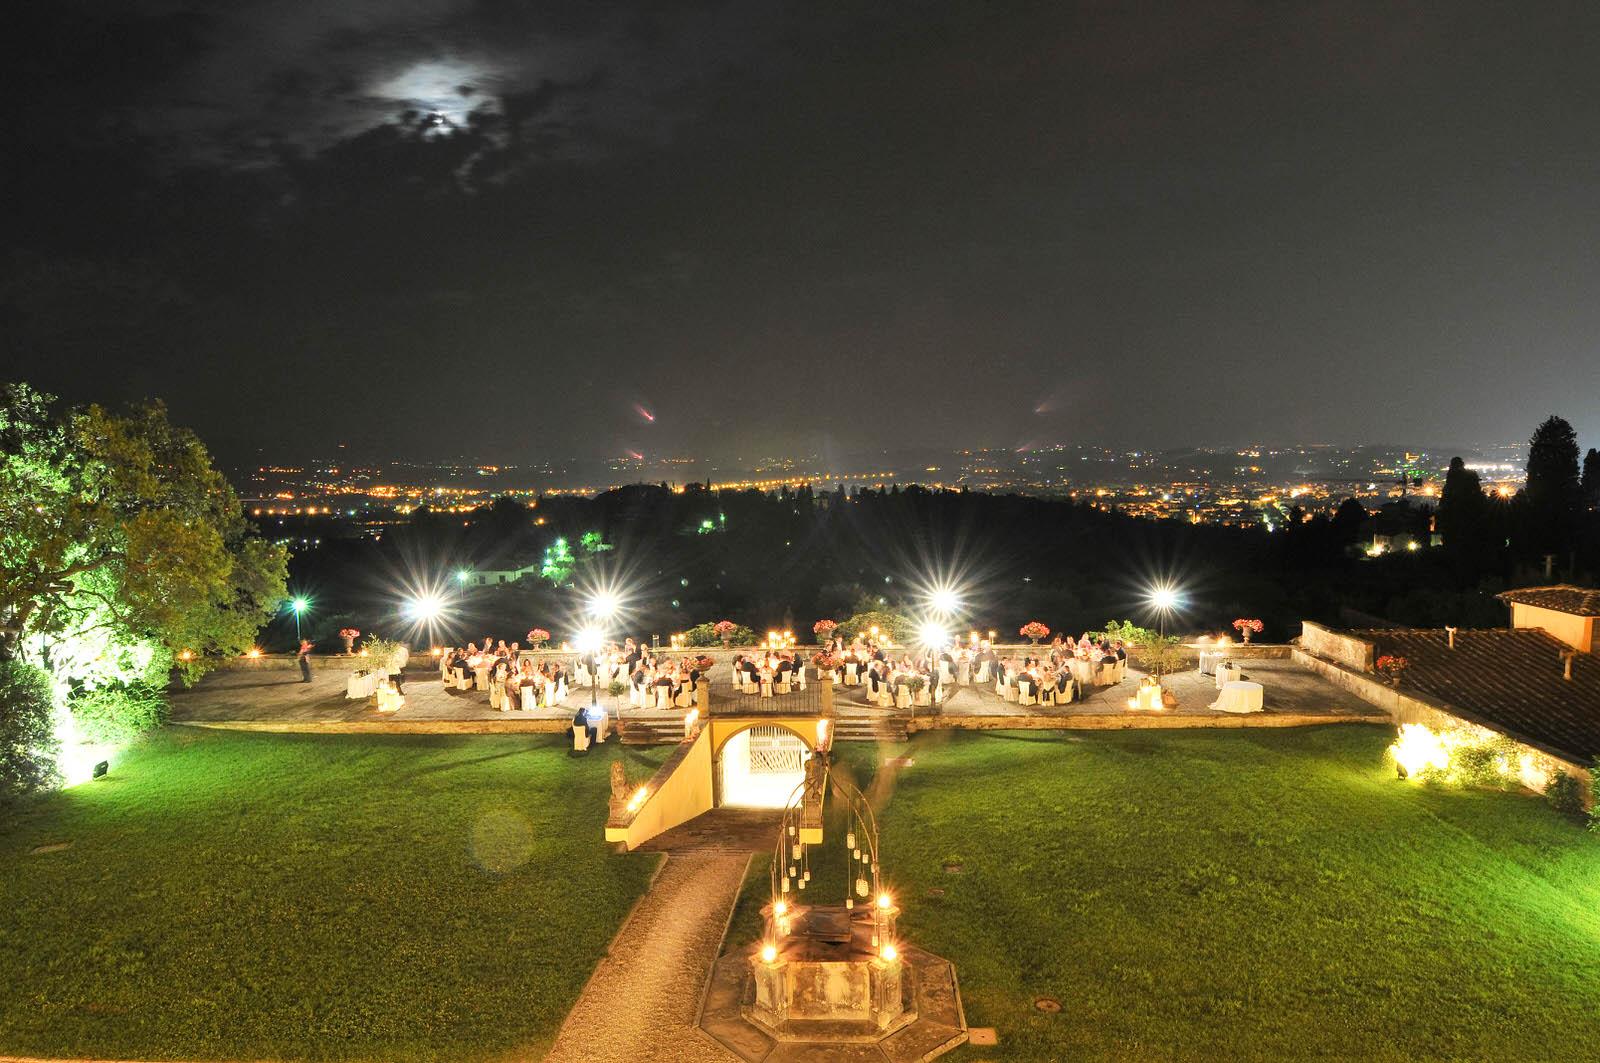 tuscany-wedding-planners-lightsound-11.jpg